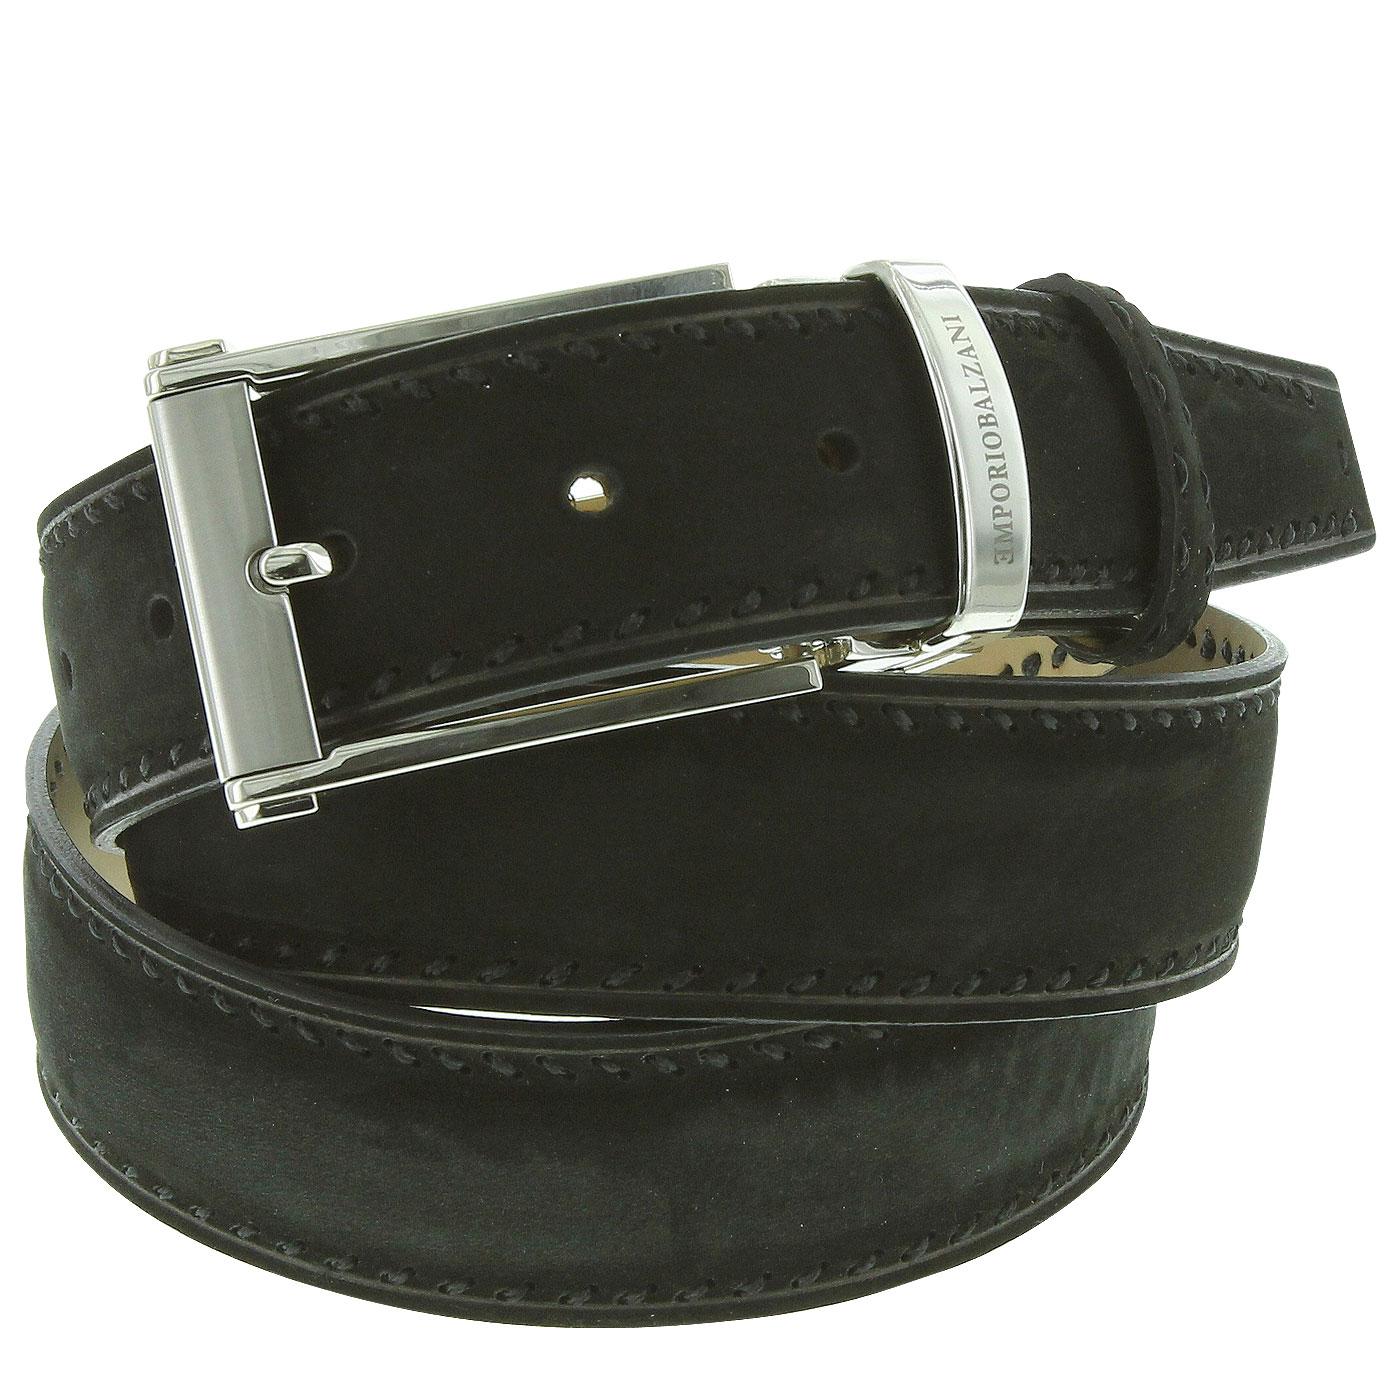 leather belts find all designs on webmenshirts